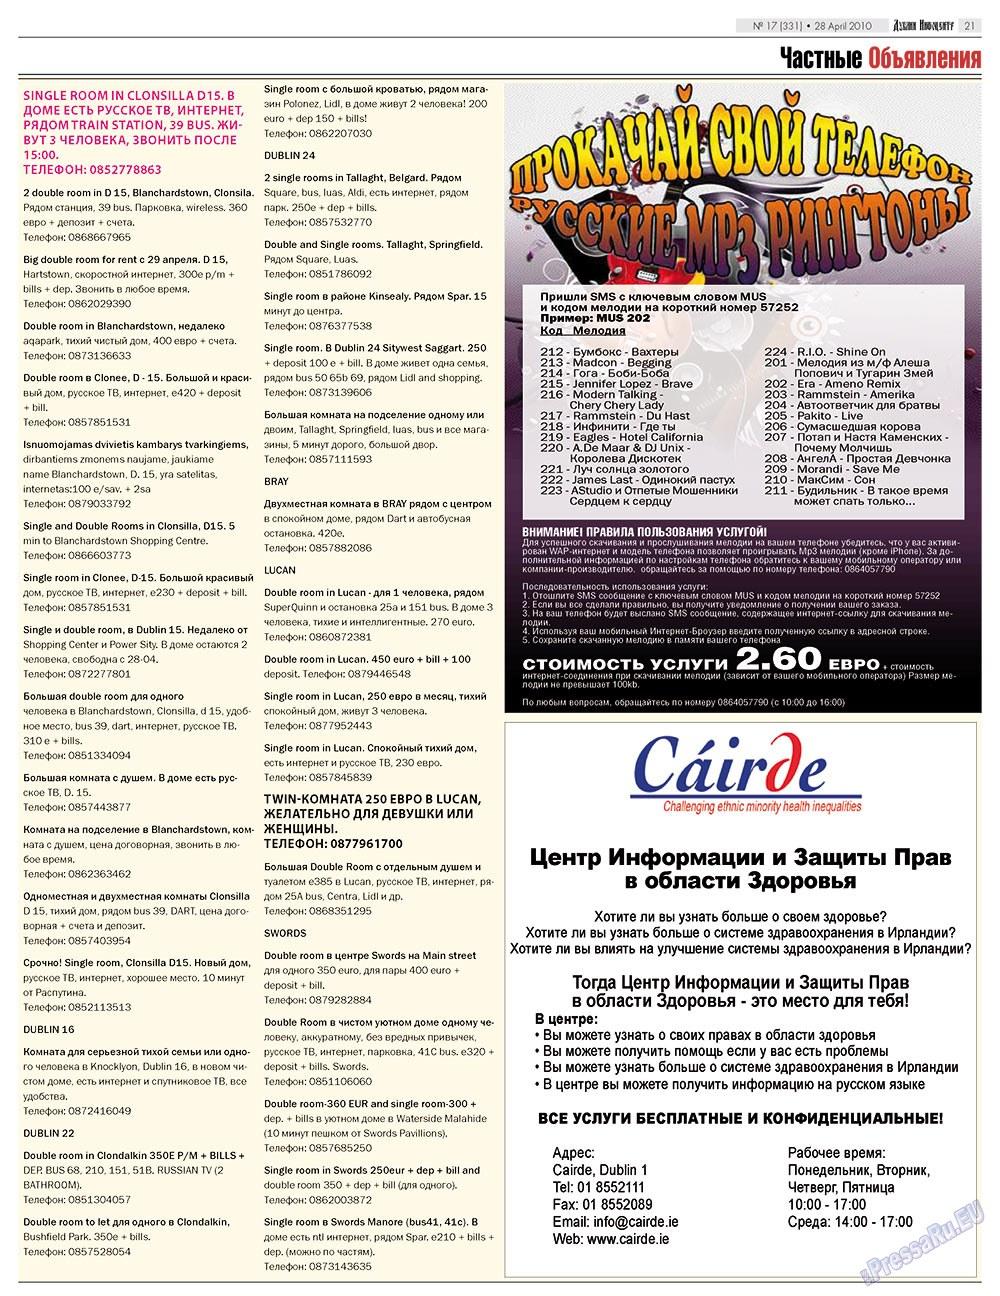 Дублин инфоцентр (газета). 2010 год, номер 17, стр. 21